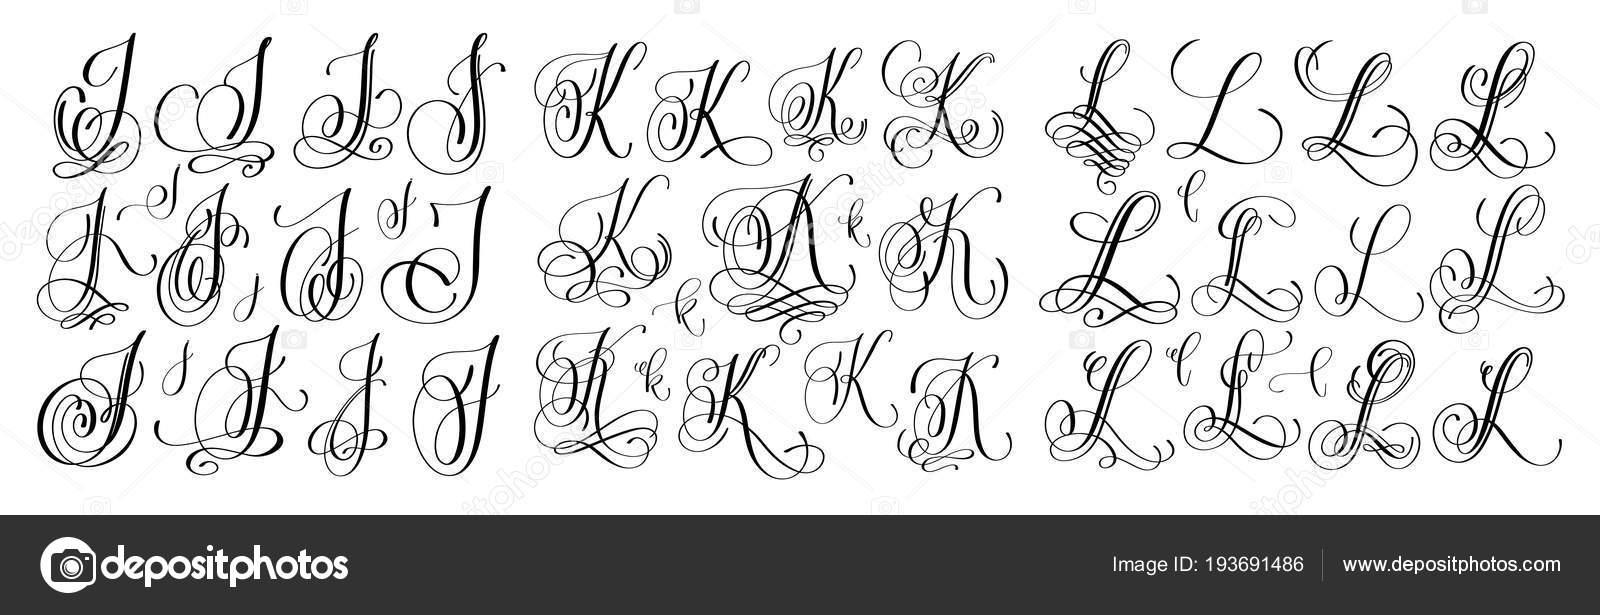 набор букв каллиграфии J K и L скрипт шрифта